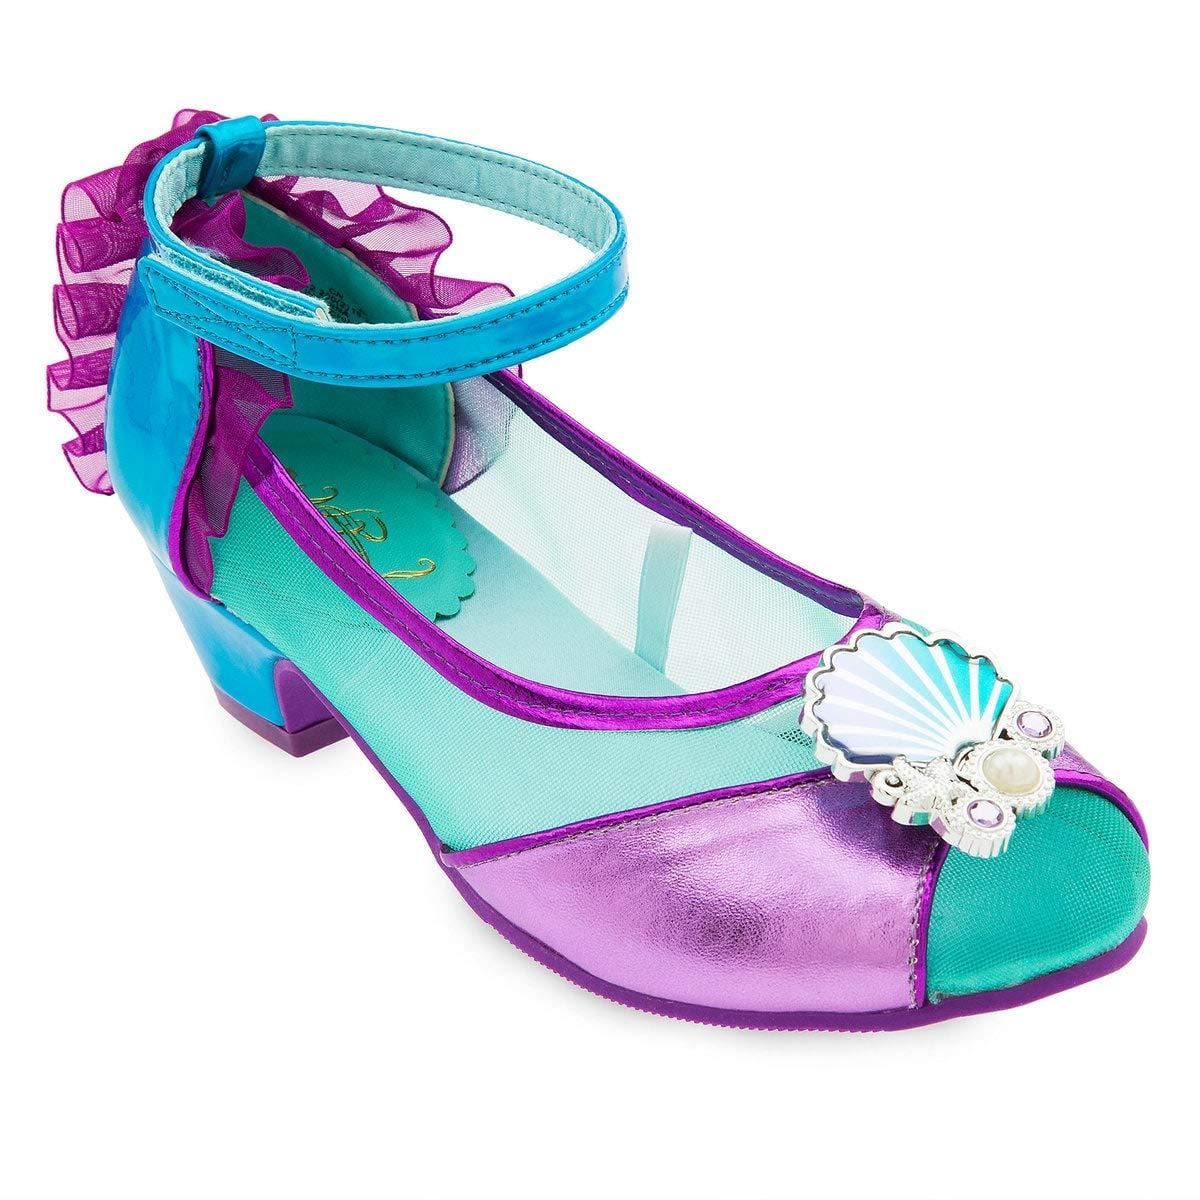 Disney Little Mermaid Ariel Costume Shoes